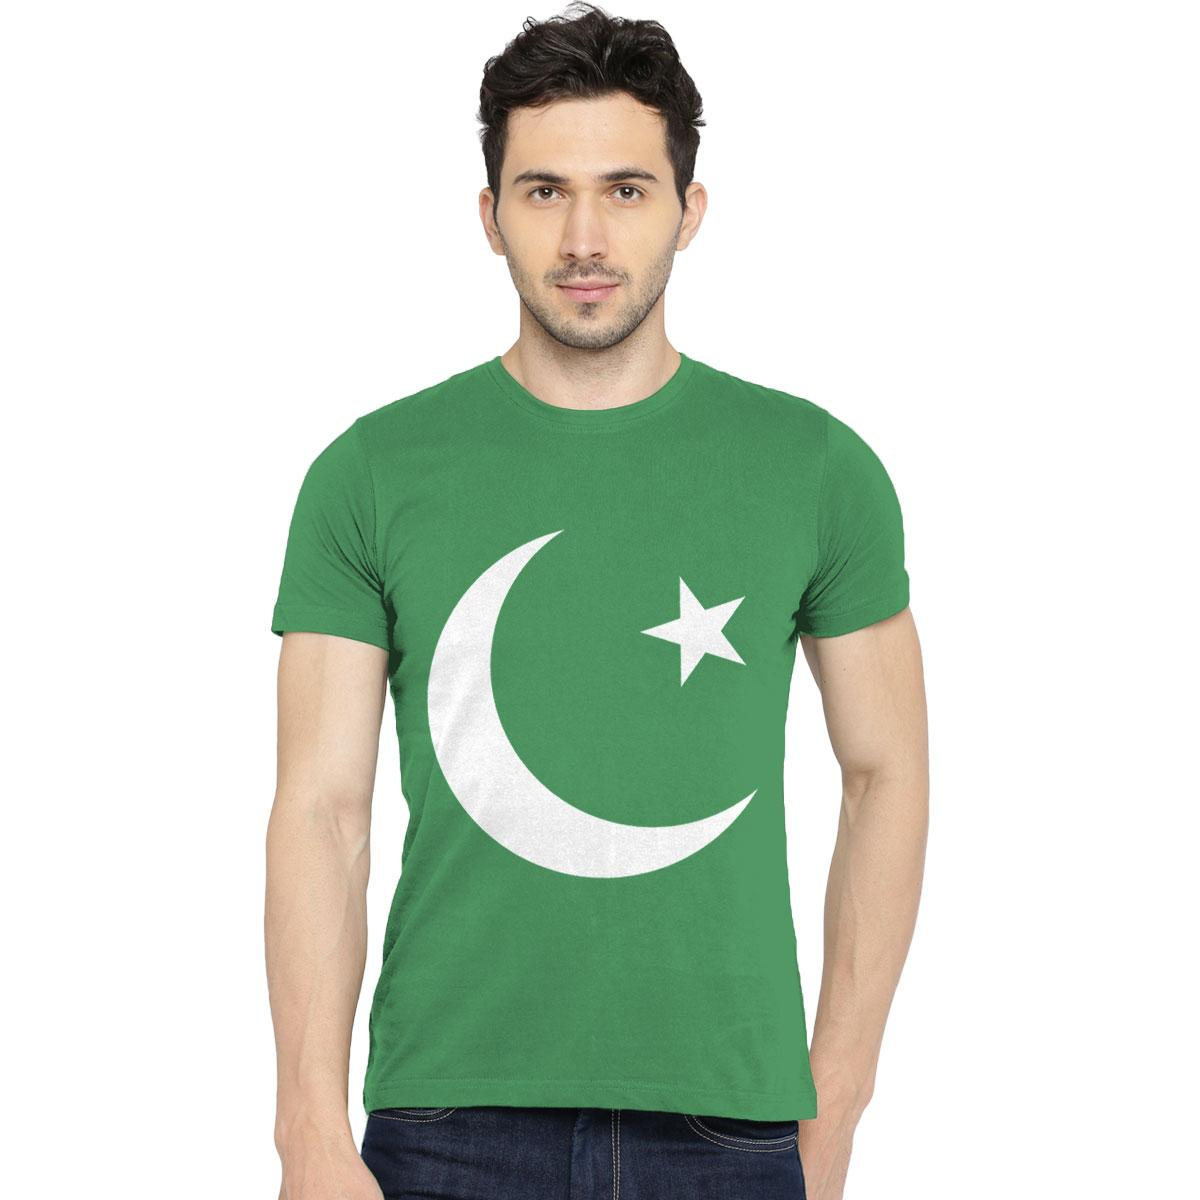 7617af05a678 New Men's T-Shirts | Branded T-Shirts for Men in Pakistan - Daraz.pk